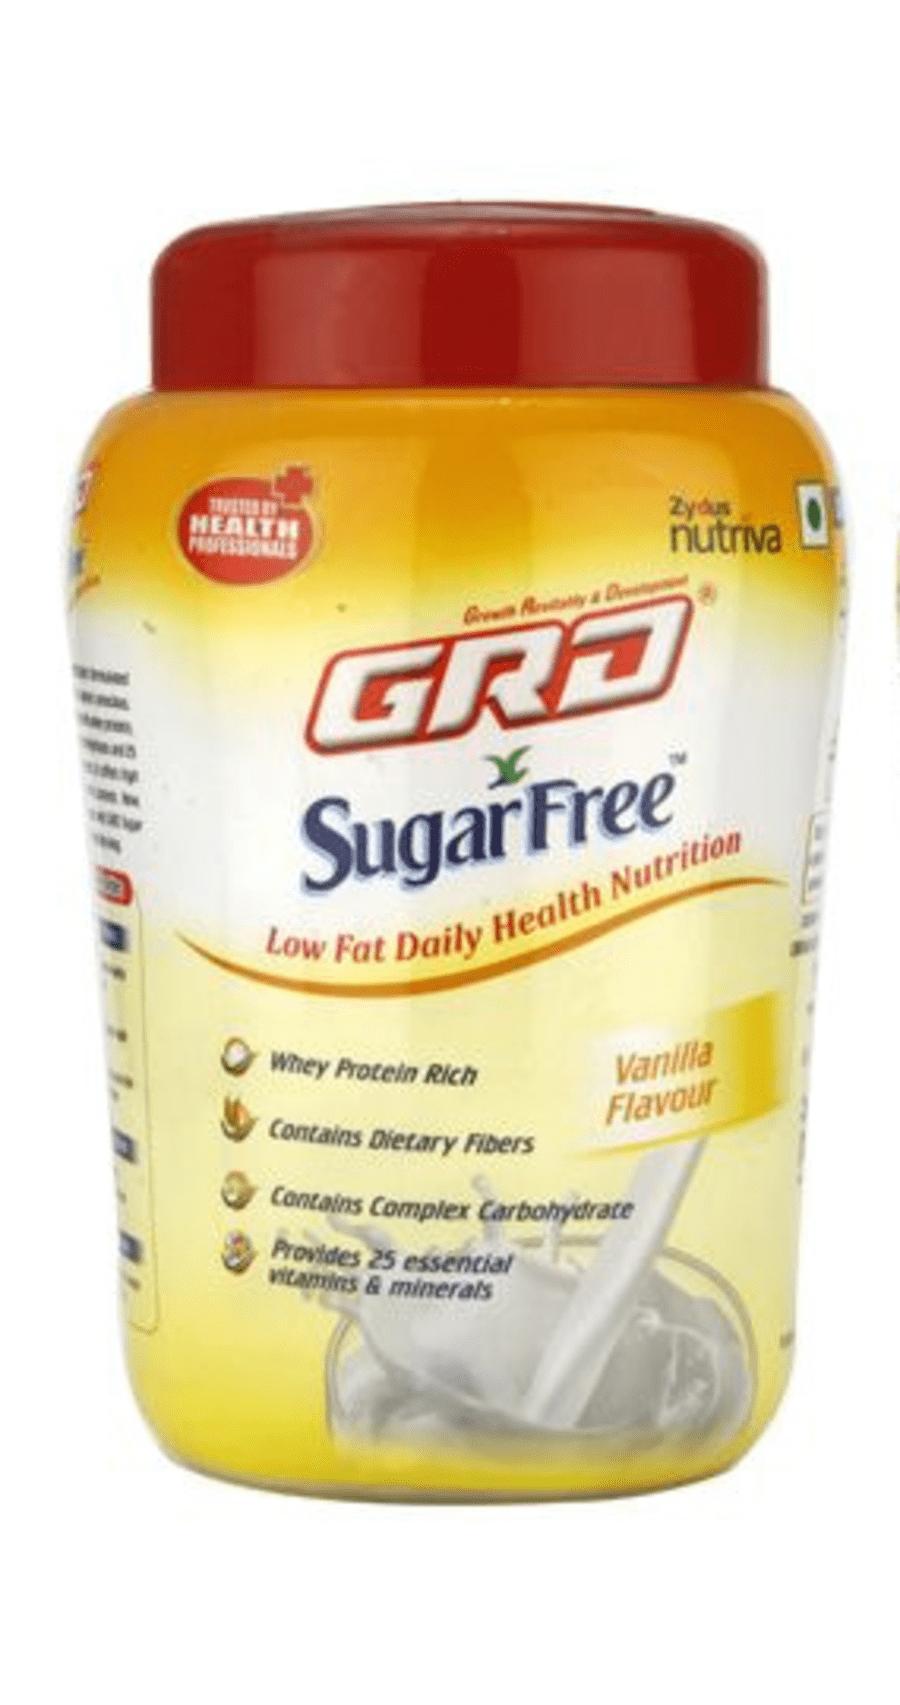 Grd Sugarfree Powder Vanilla - 200gm Jar